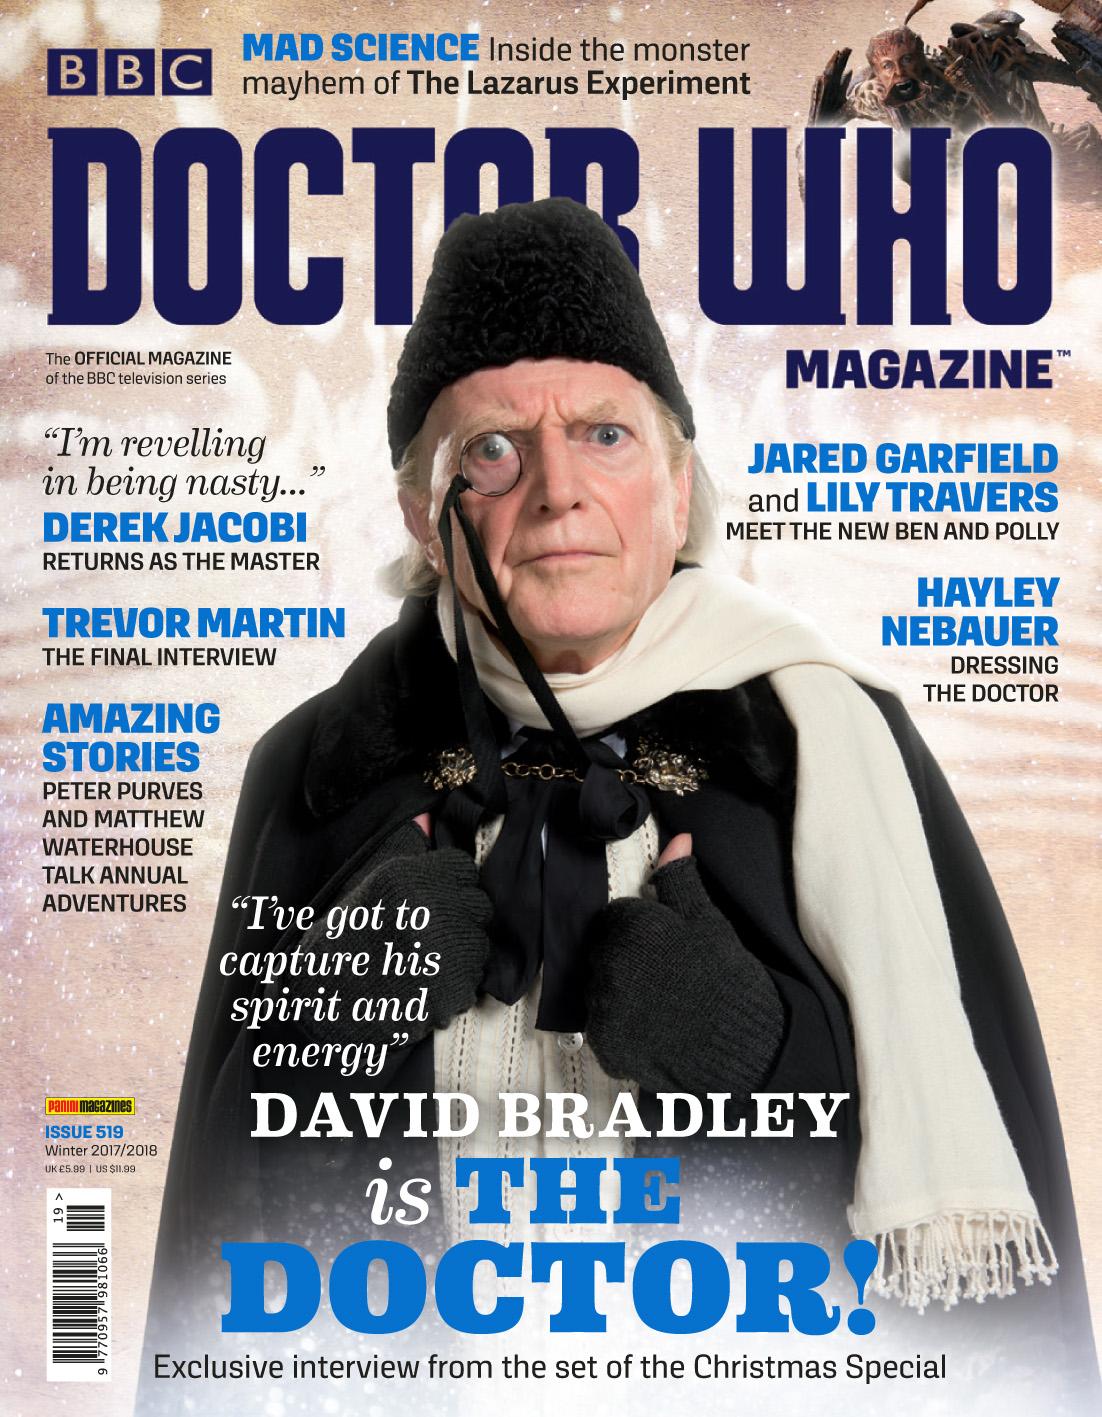 Doctor Who Magazine - 519 (Credit: Panini)